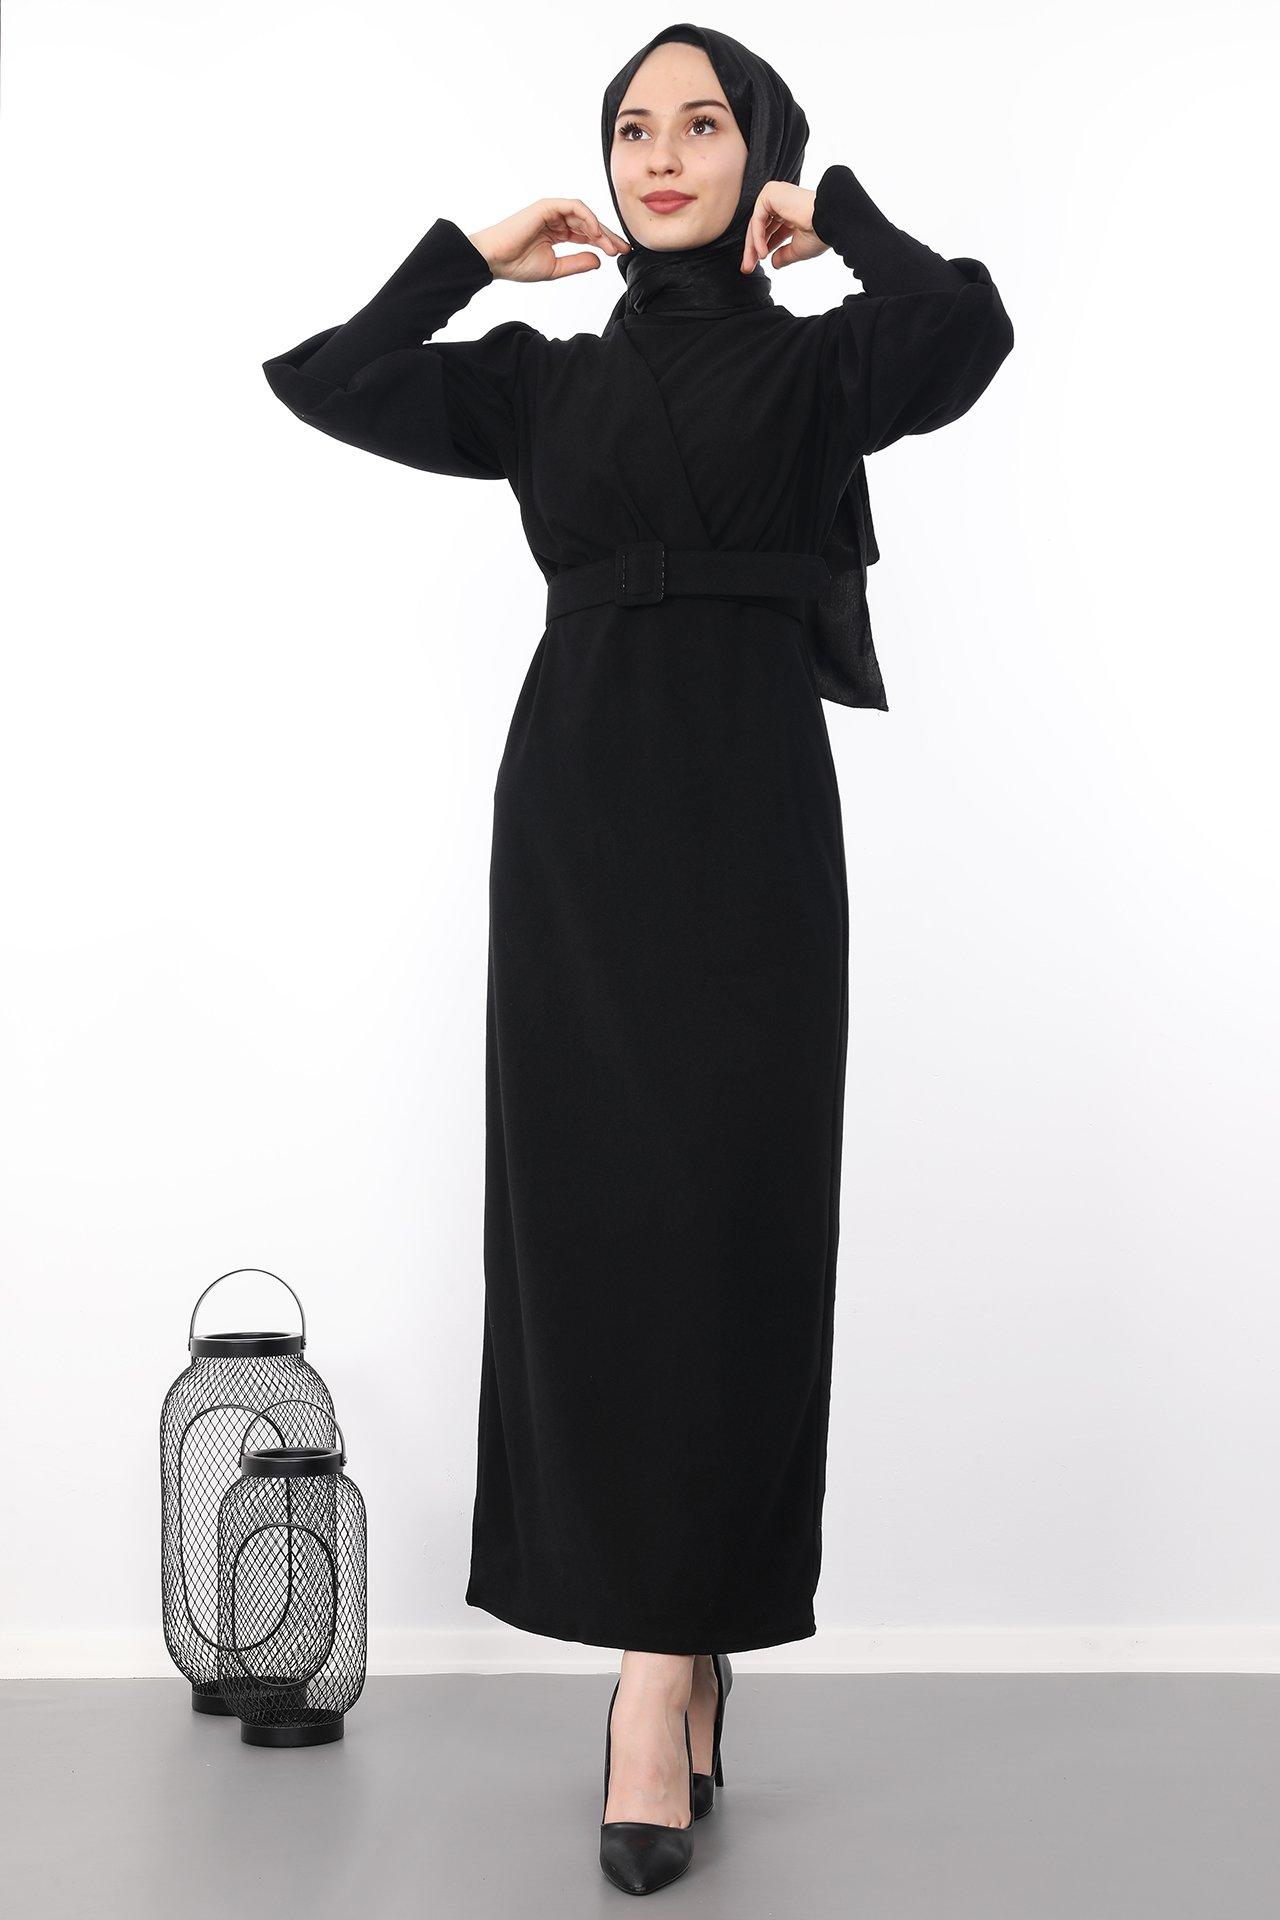 GİZAGİYİM - Kadife Kalem Tesettür Elbise Siyah